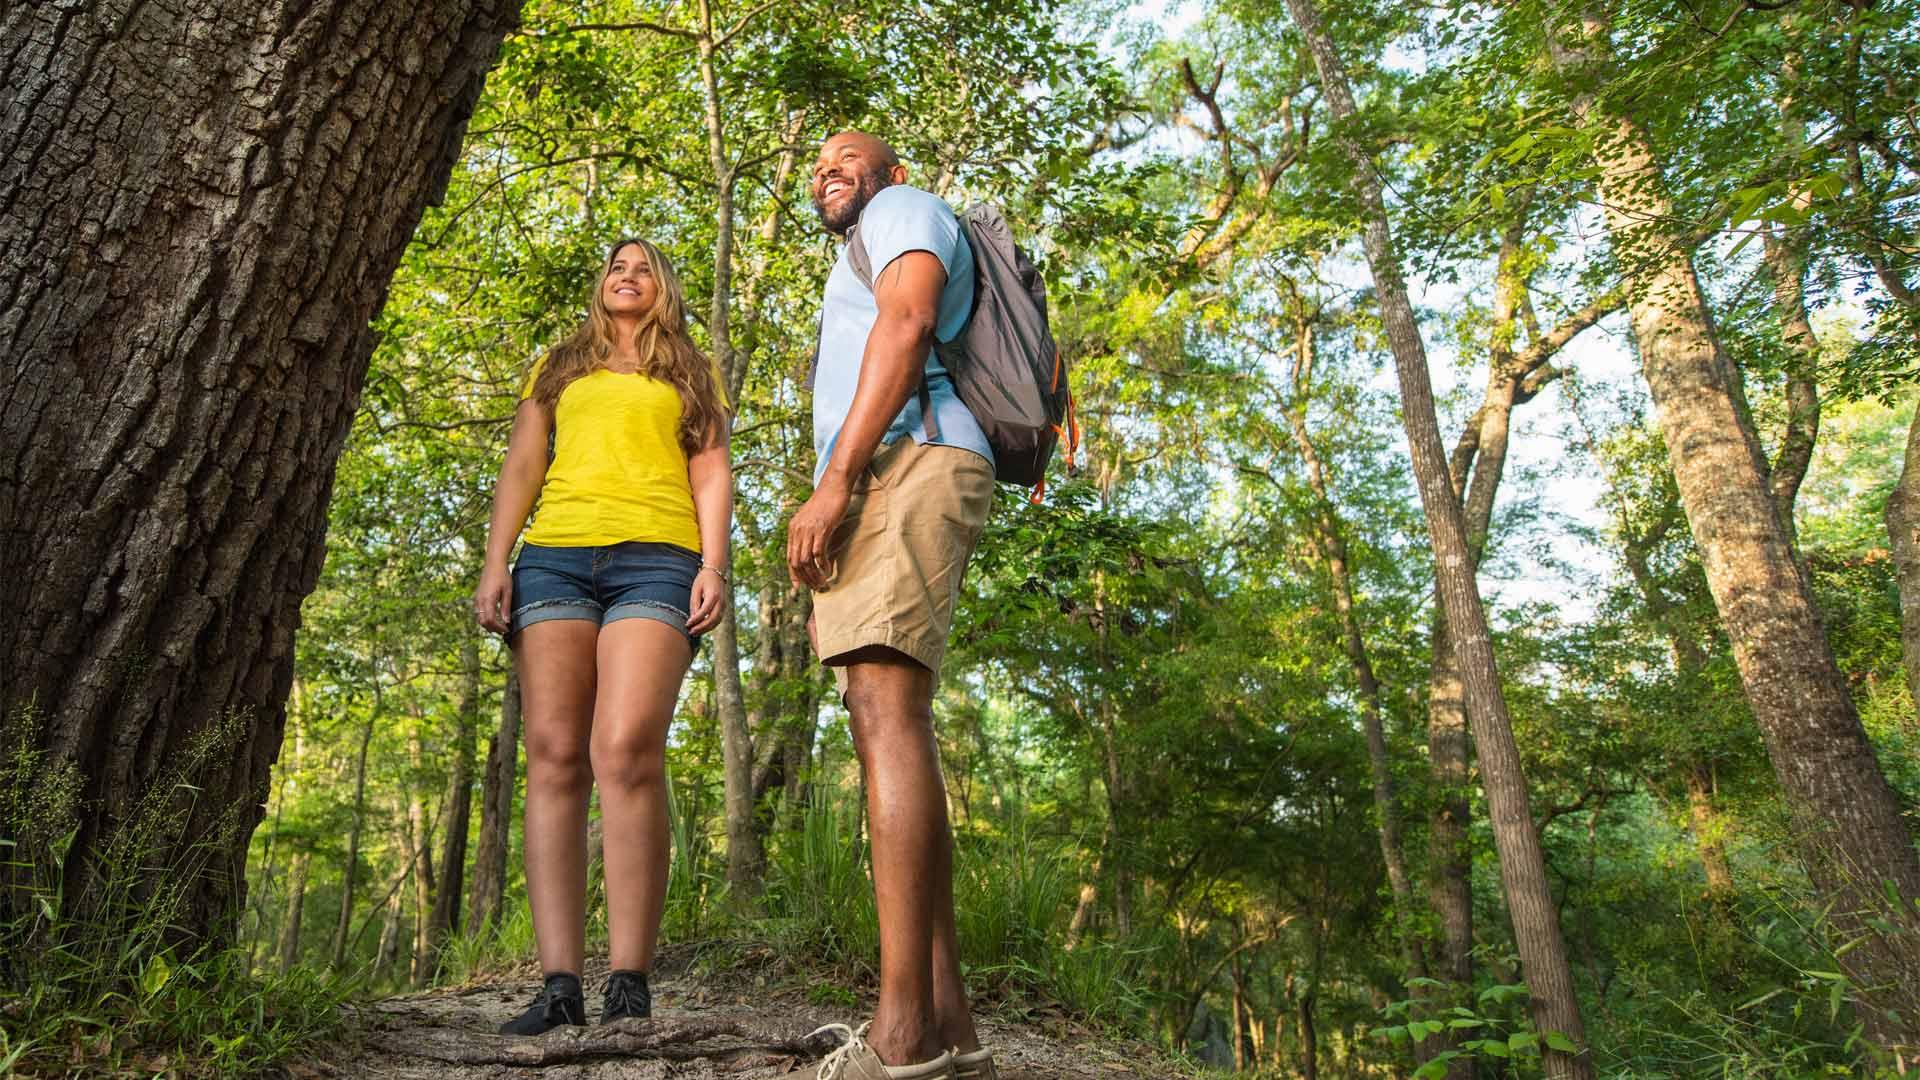 Couple smile while hiking